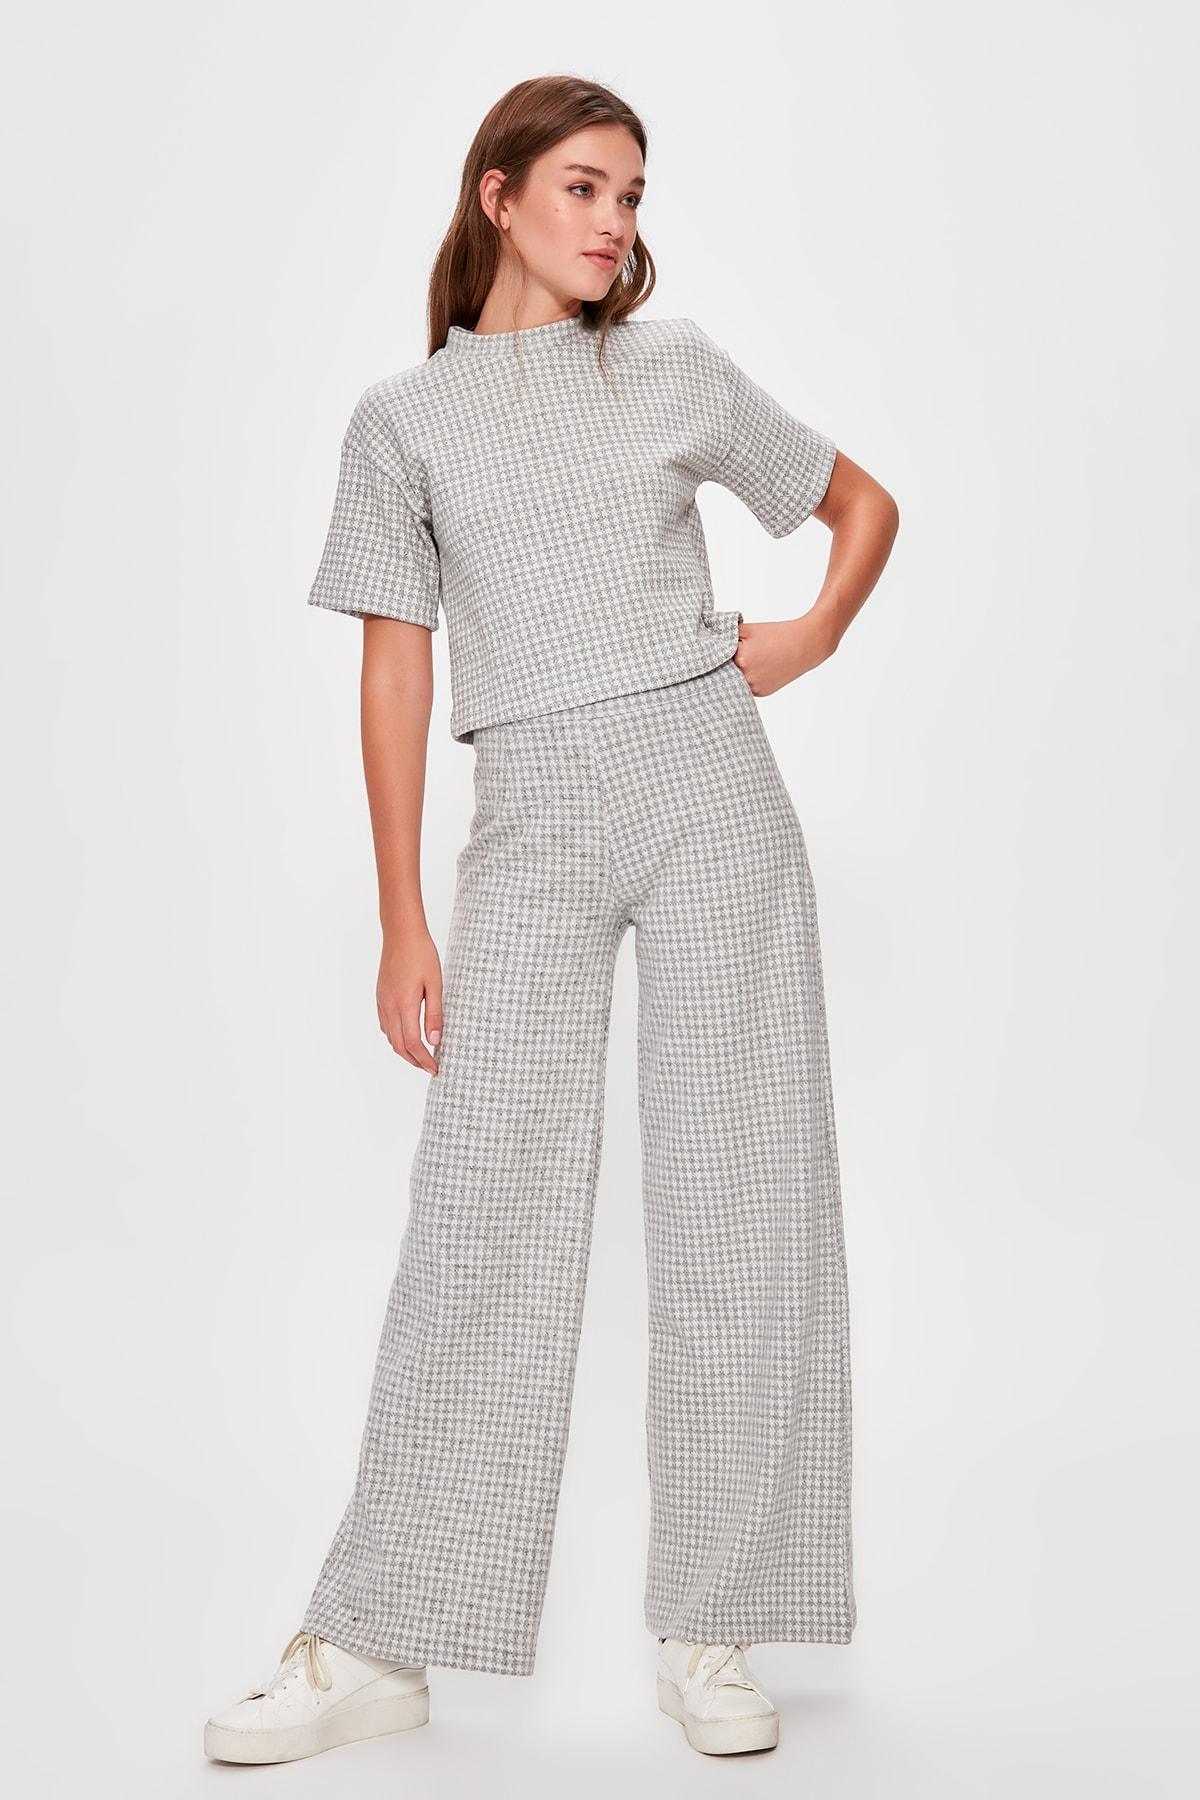 Trendyol Gray Textured Knit Pants TWOAW20PL0242